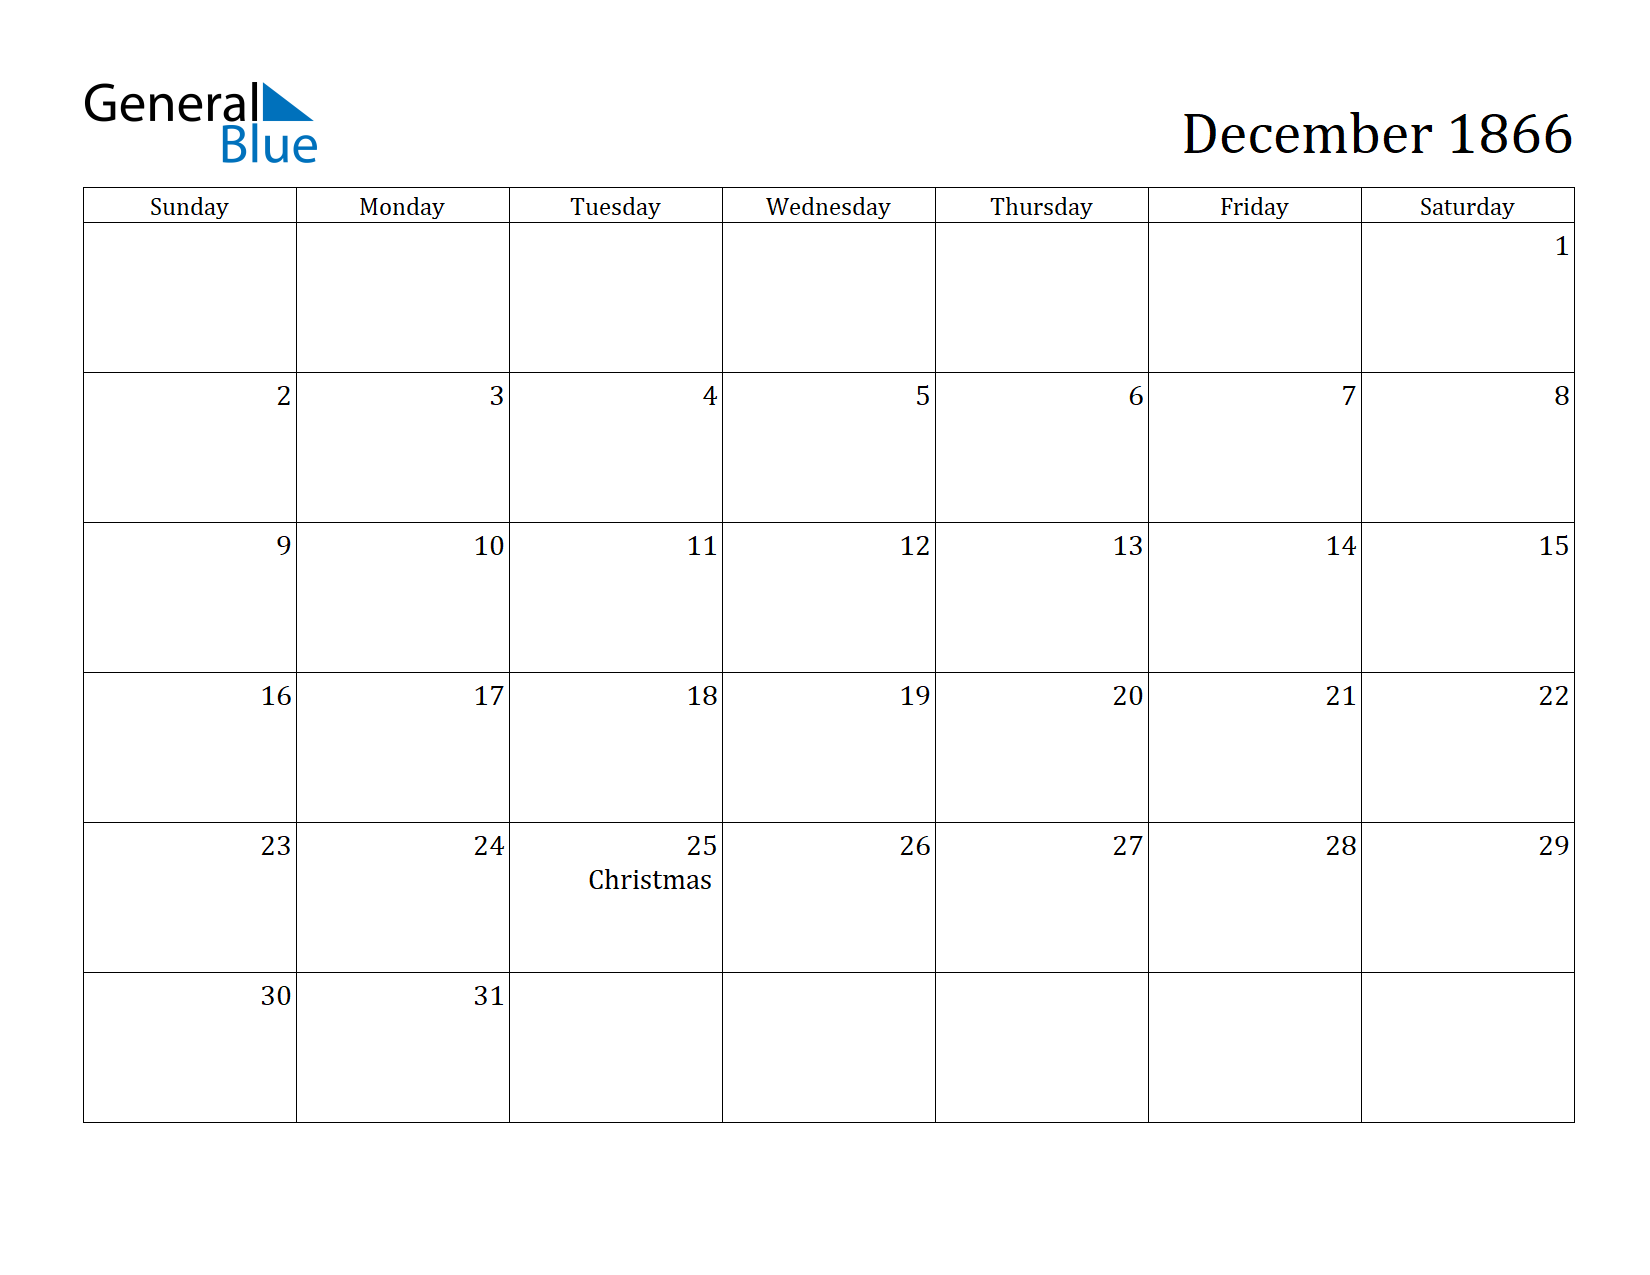 Image of December 1866 Calendar